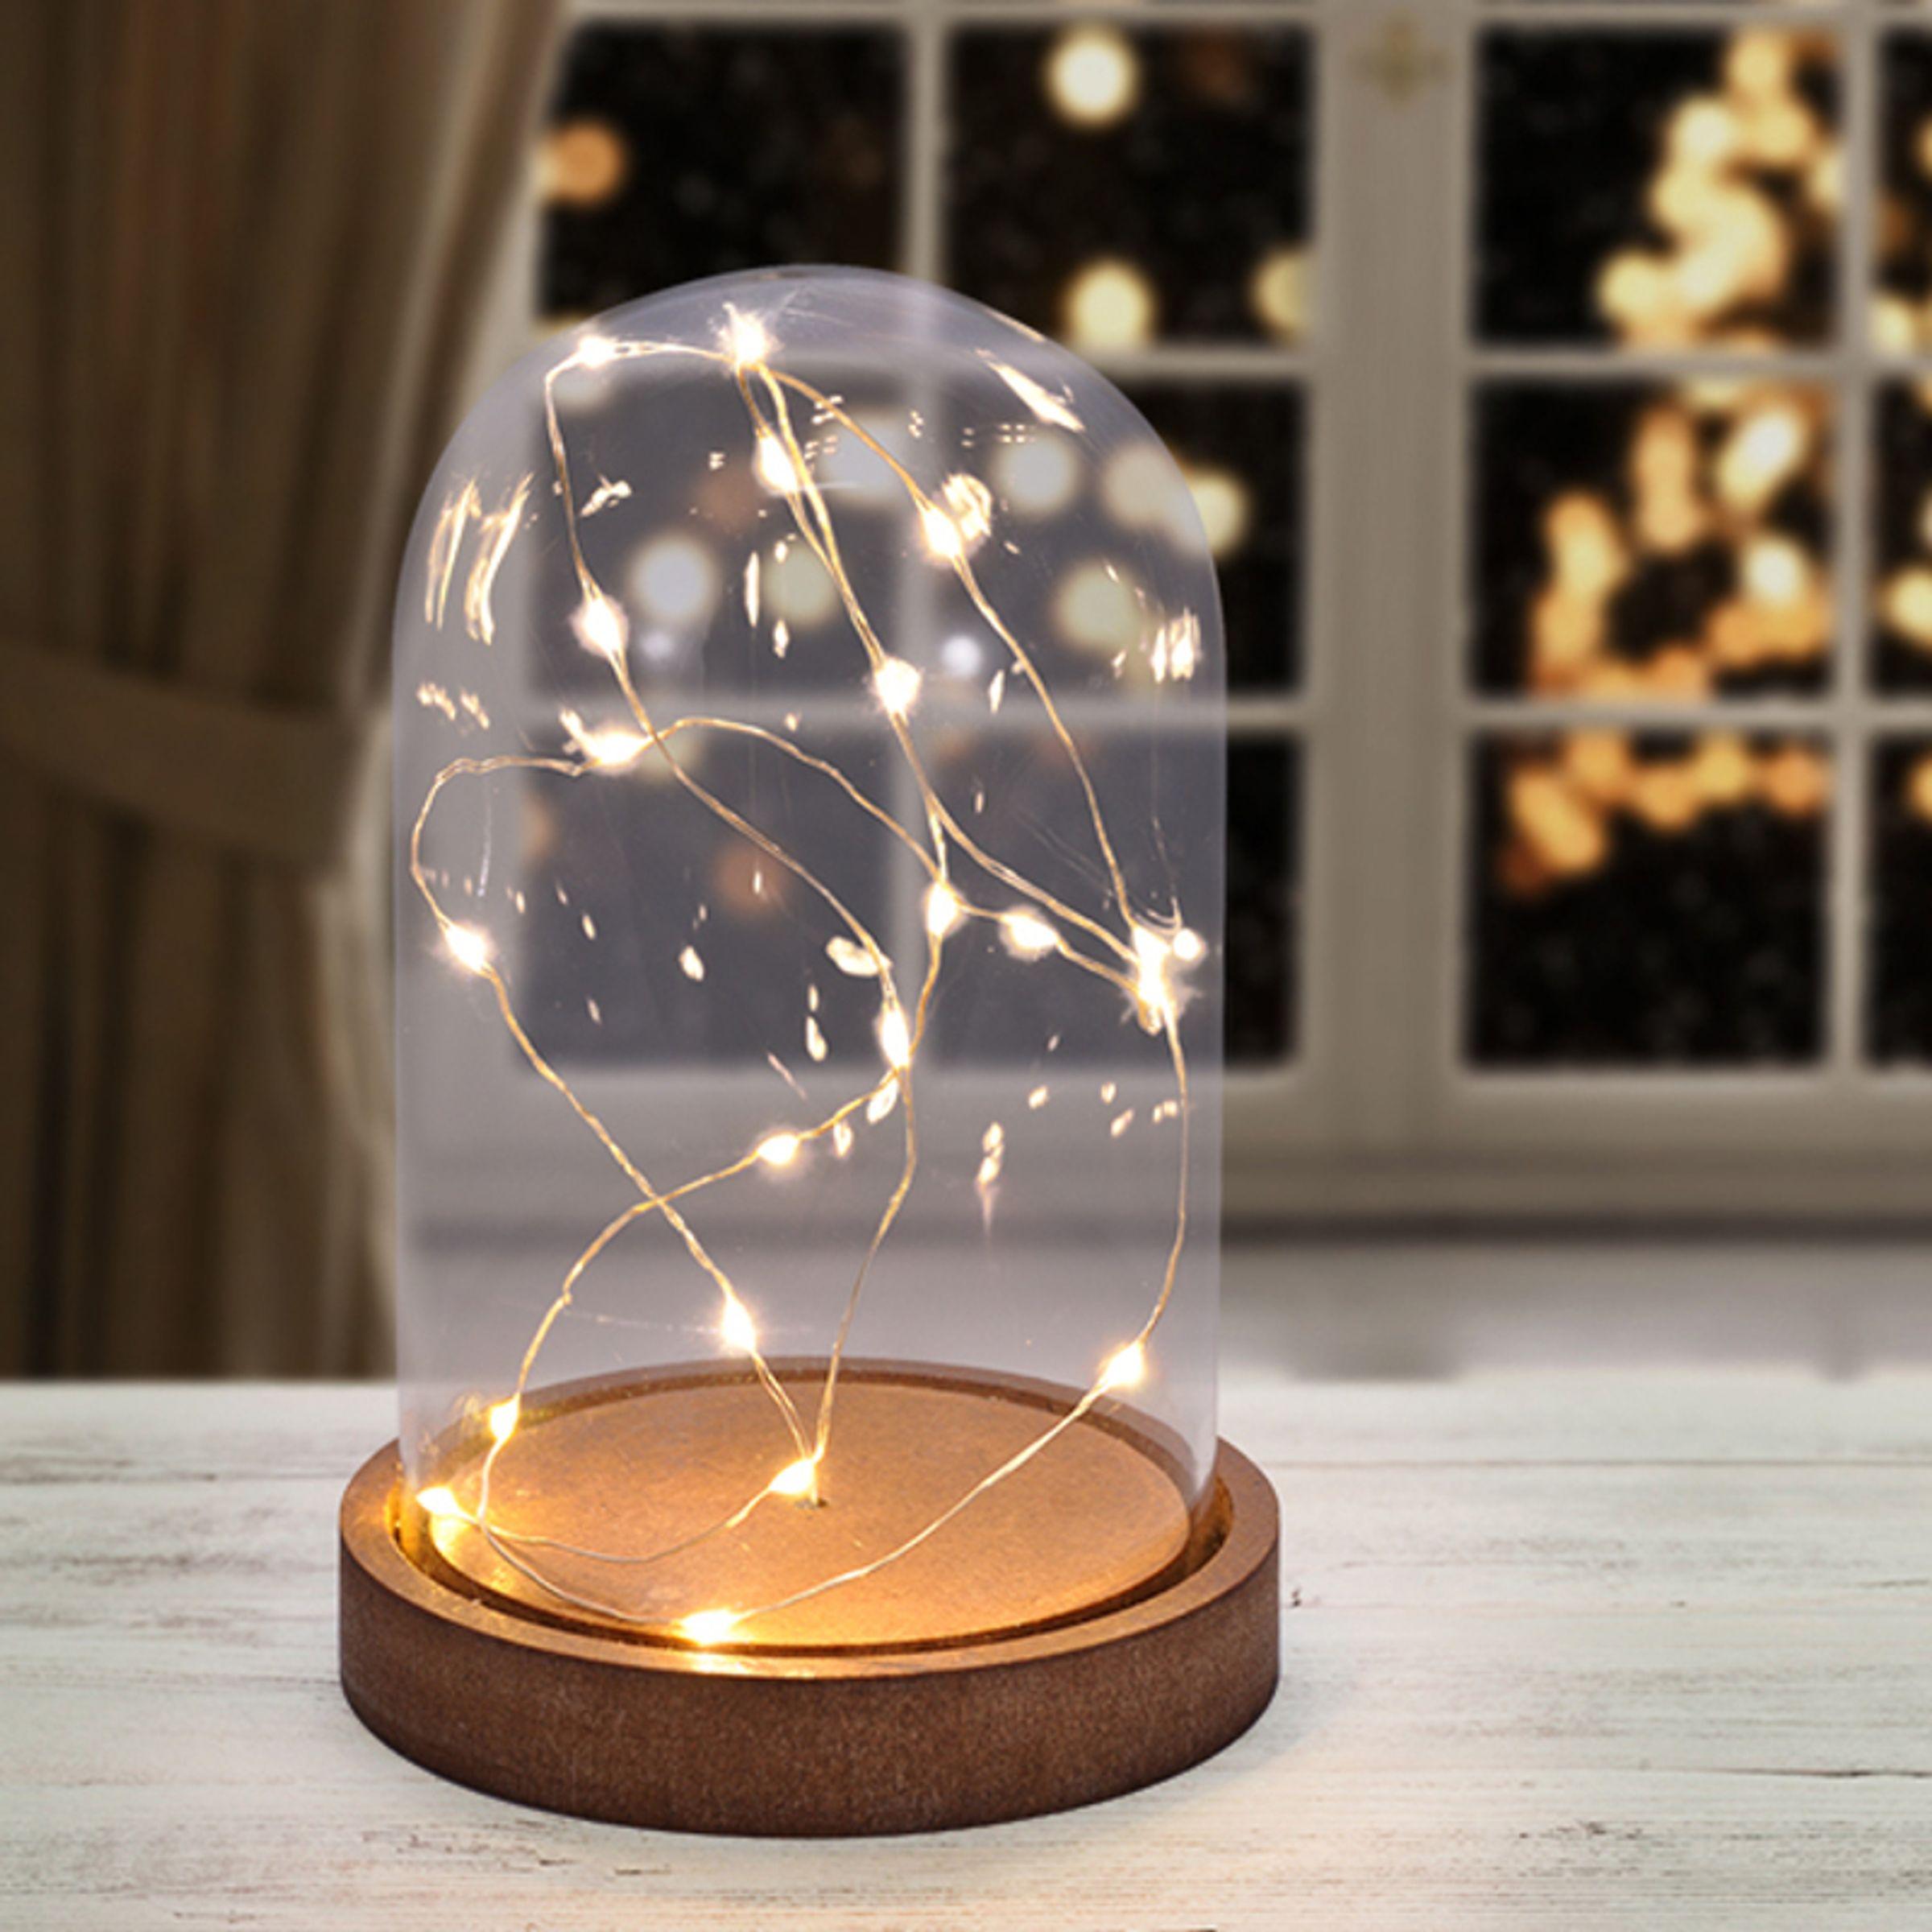 Weihnachtsdeko Beleuchtet.Deko Glasglocke Bell Glas Glocke Lichter Weihnachtsdeko Beleuchtet 20 Mini Led